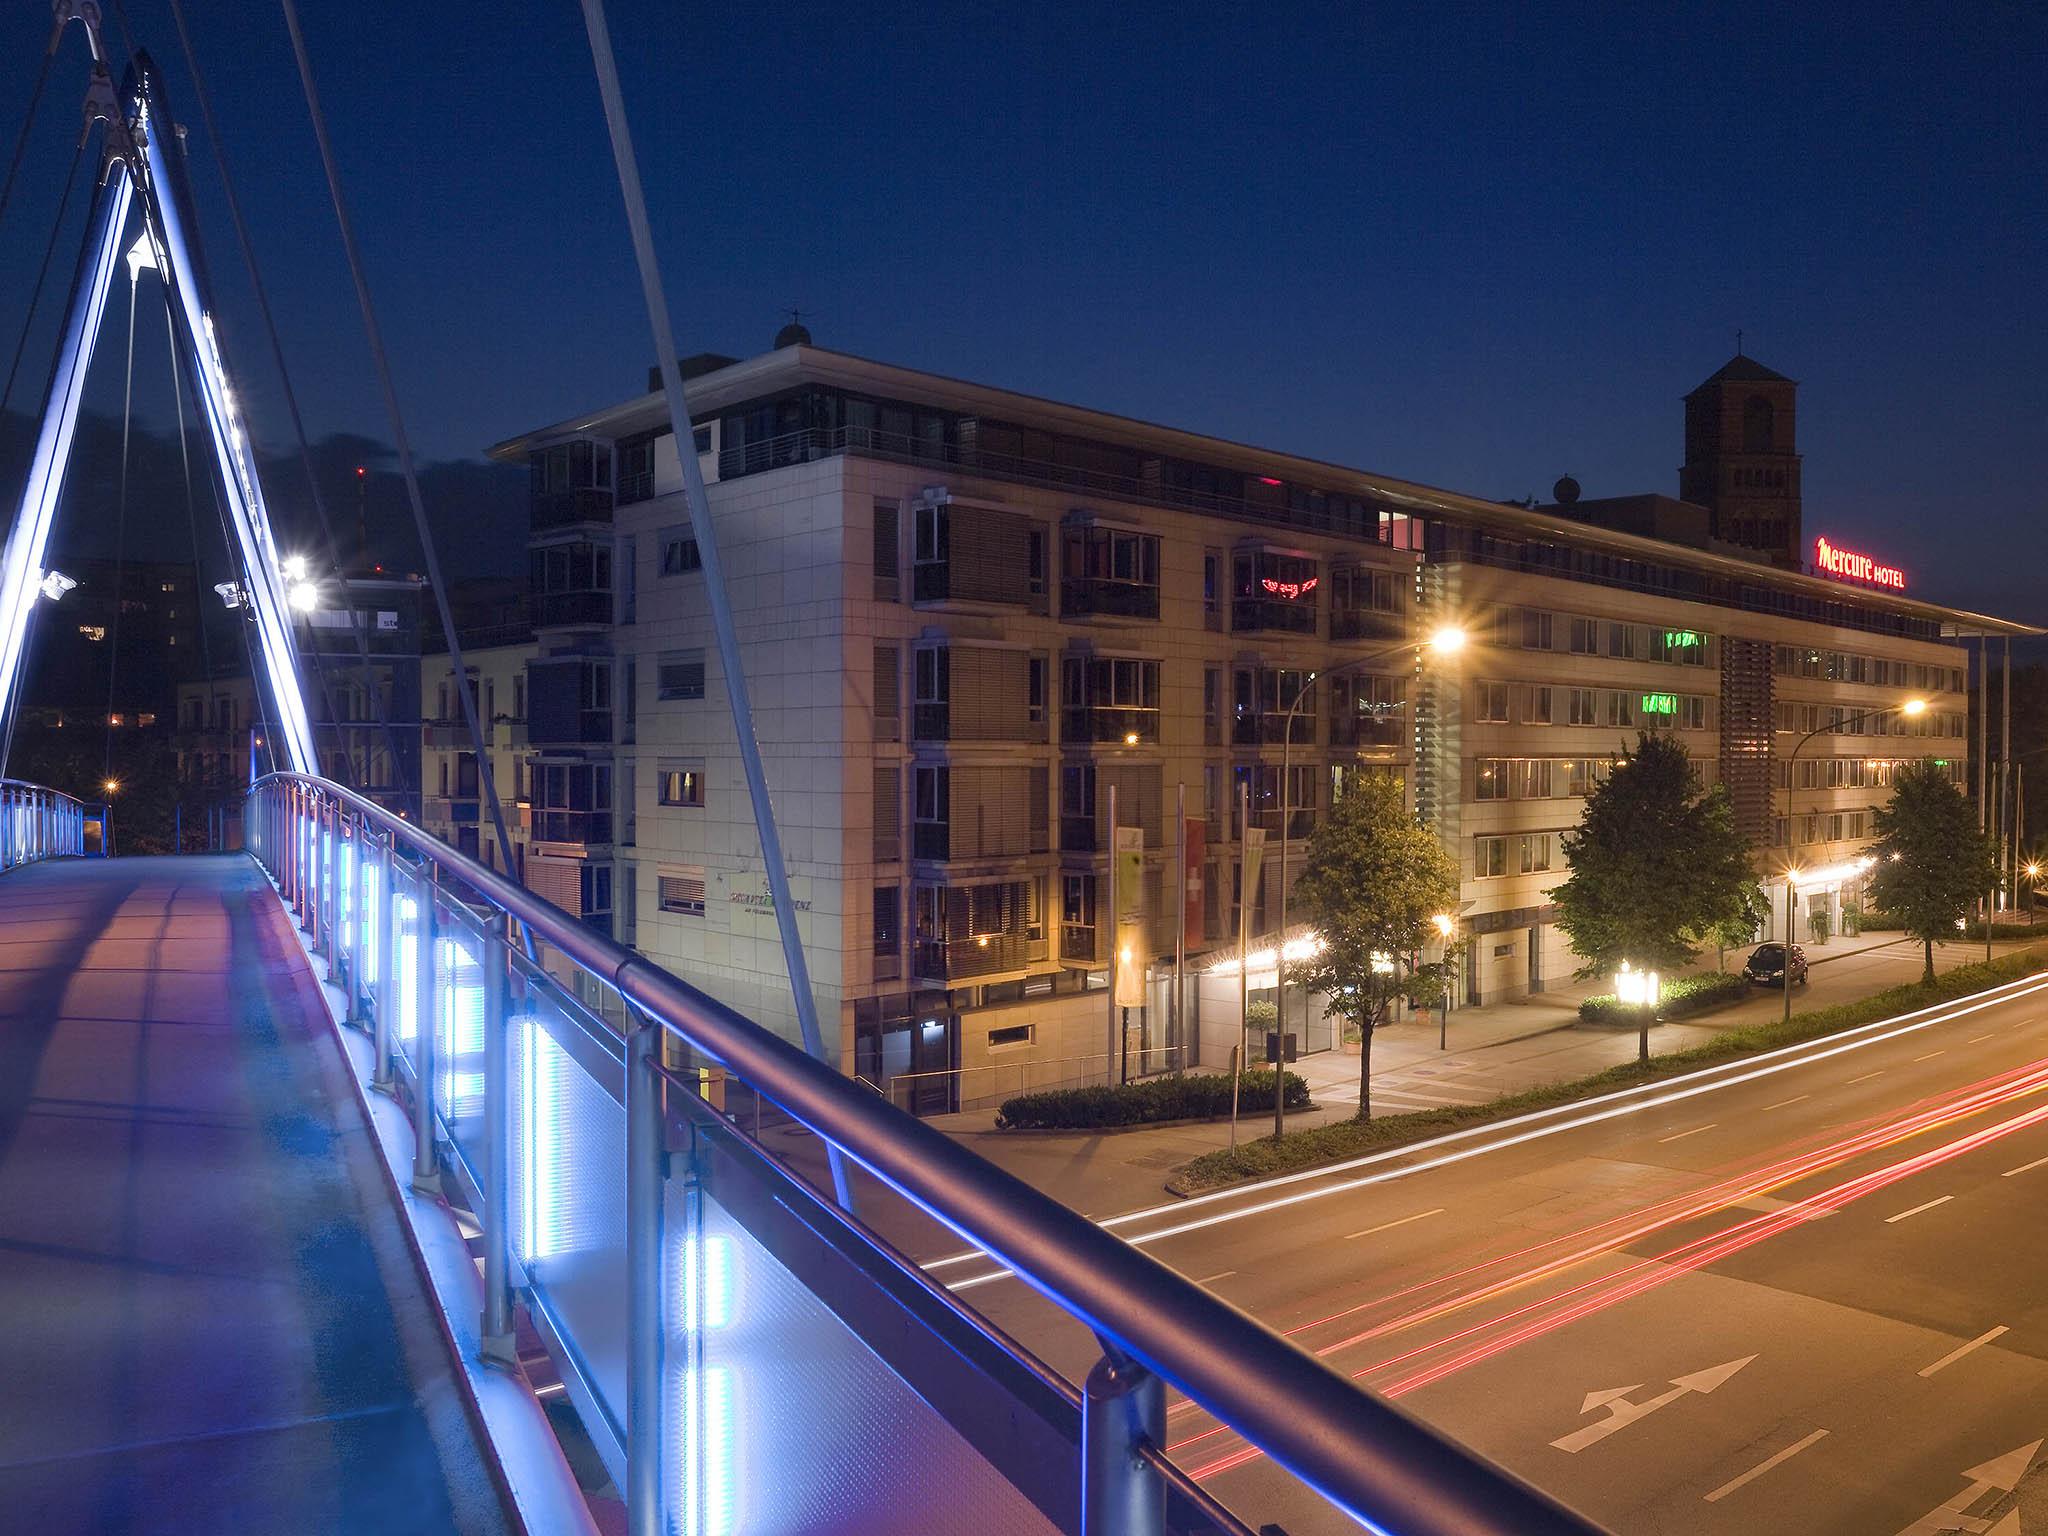 Hotel – Mercure Hotel Plaza Essen